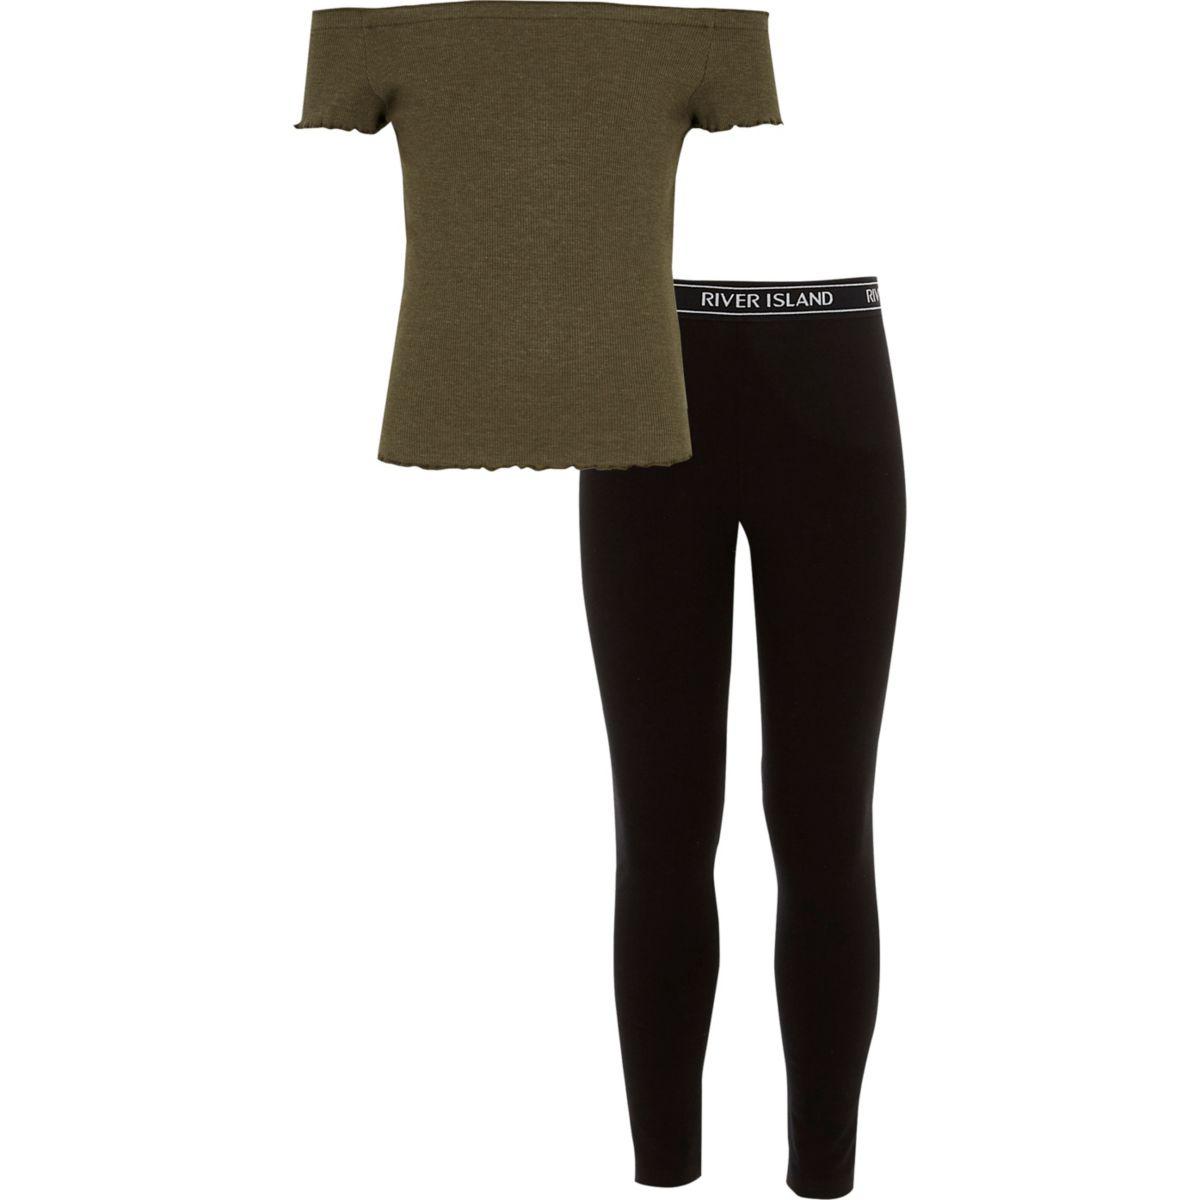 Girls khaki bardot top and RI leggings outfit